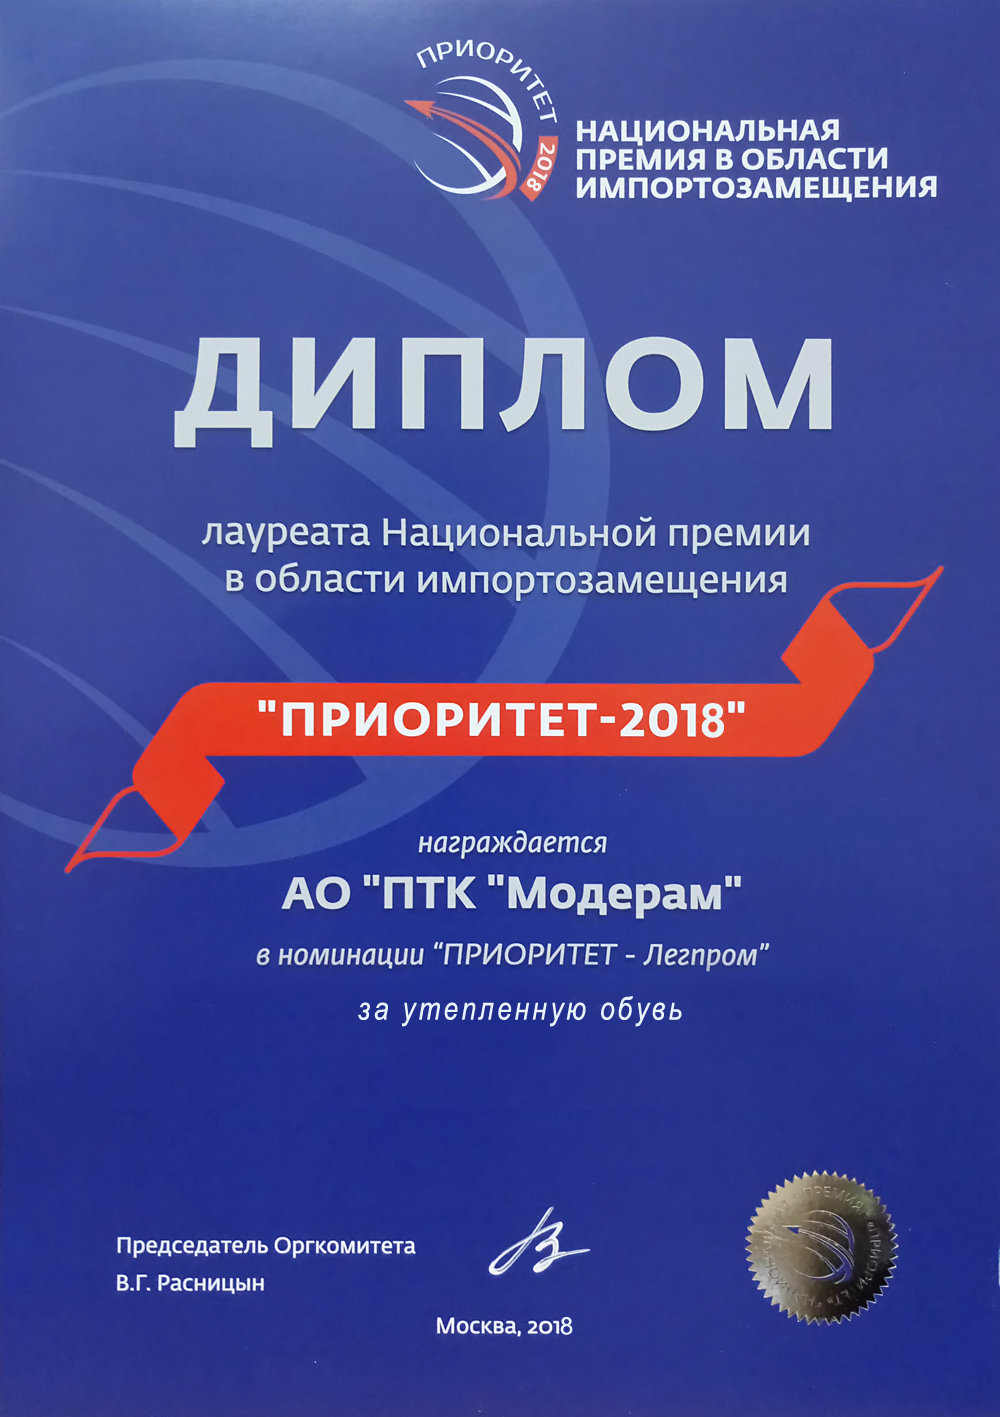 http://moderam.ru/upload/image/prioretet_diplom.jpg